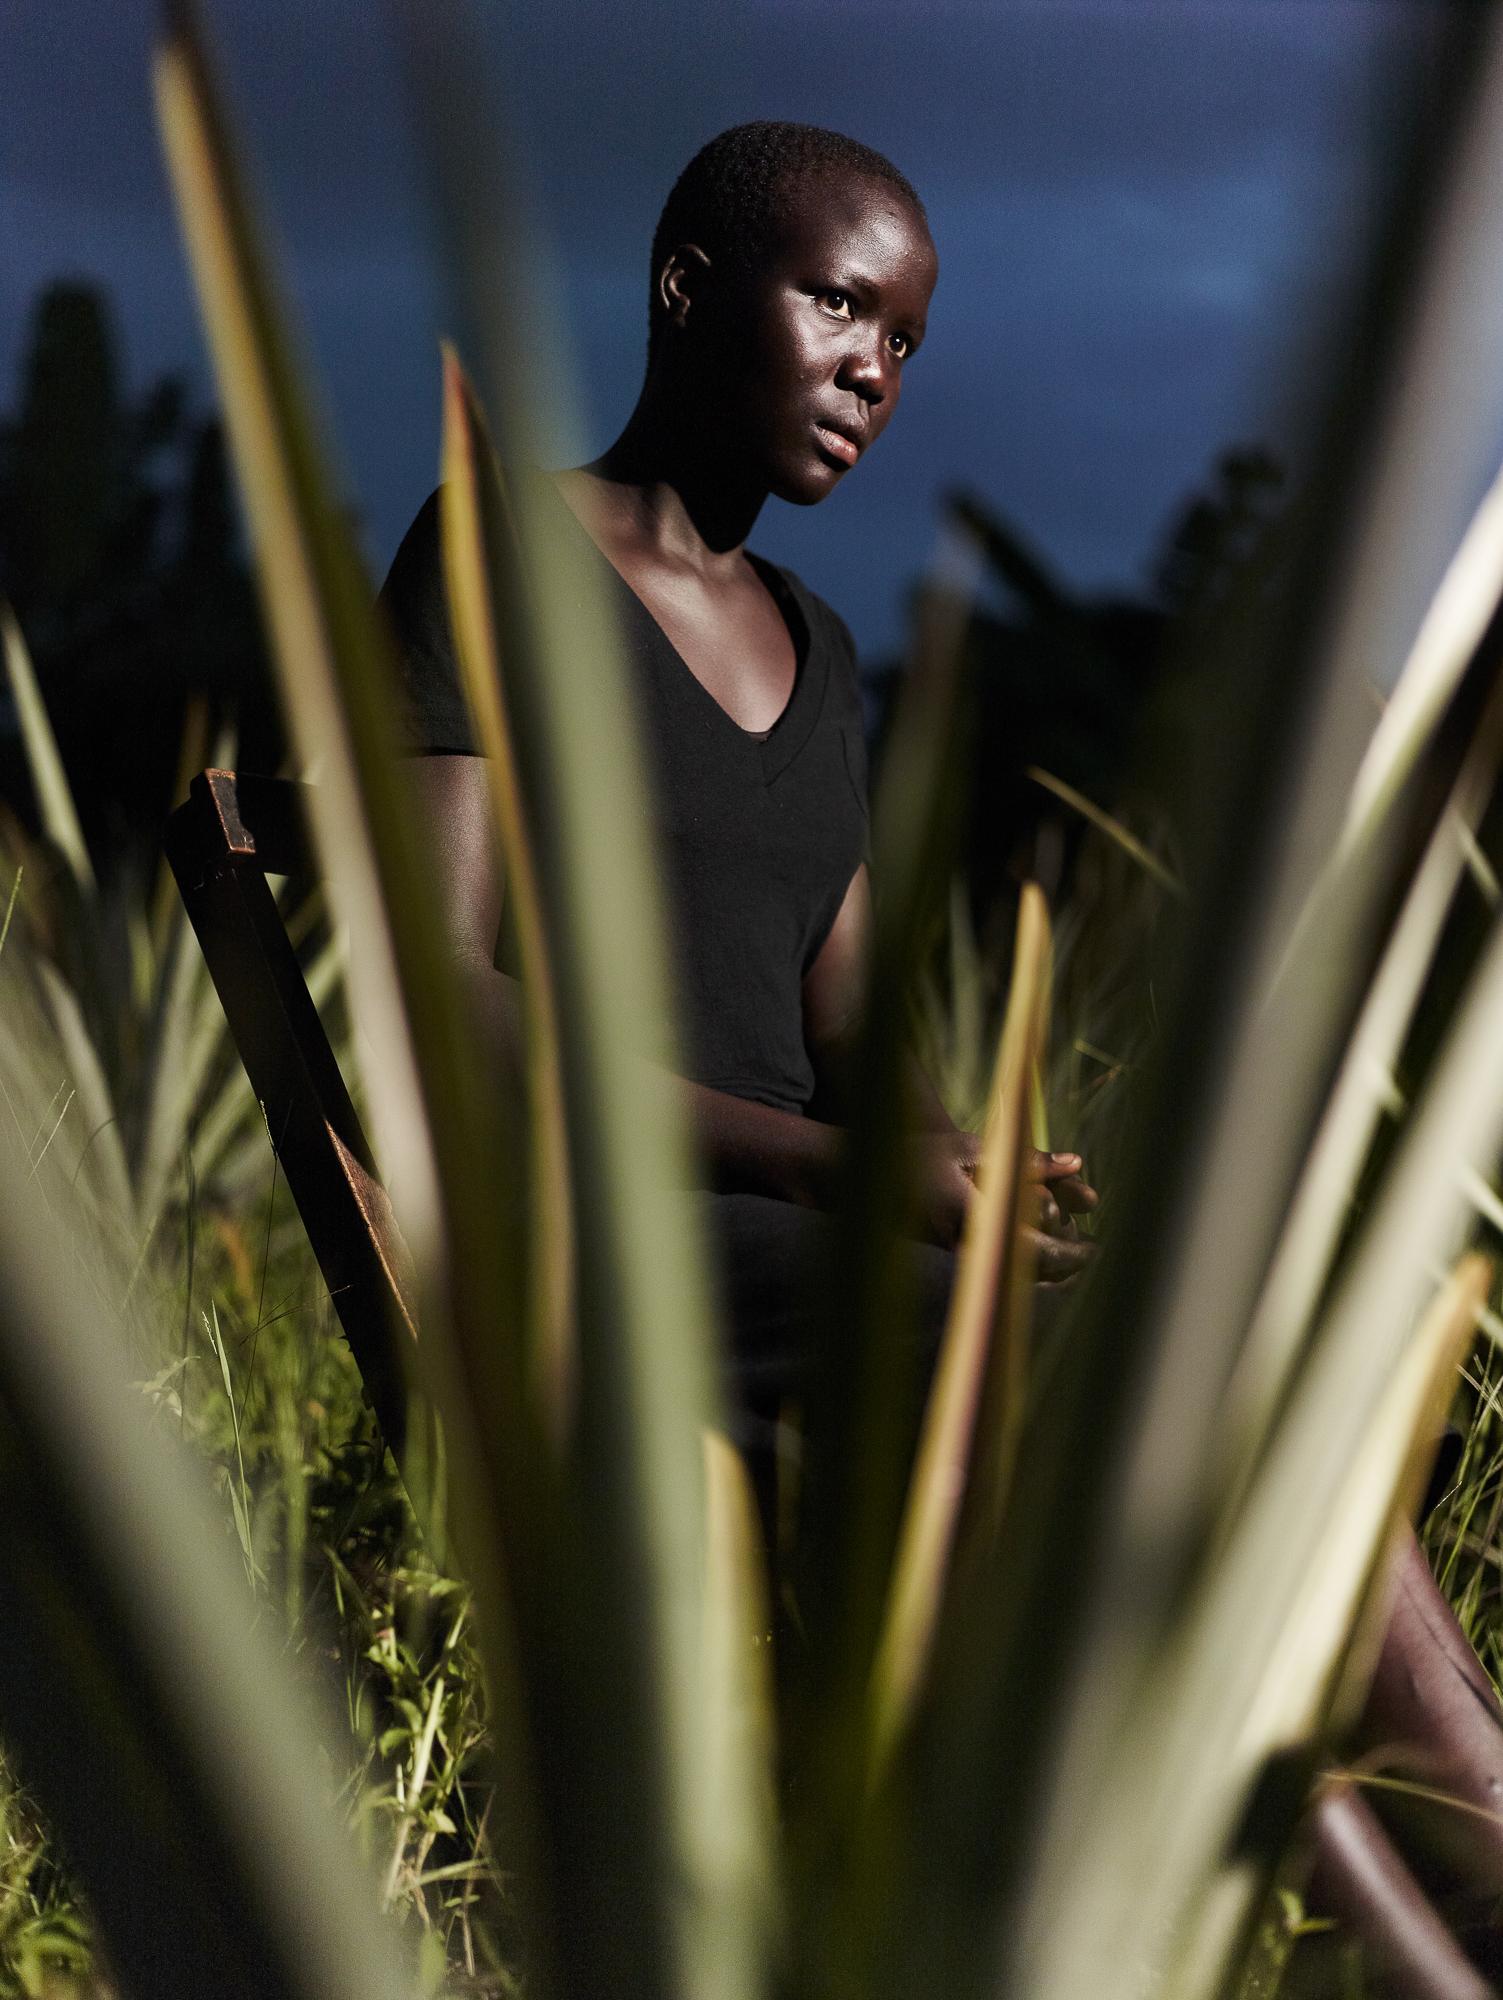 Exile_Uganda-007392.jpg